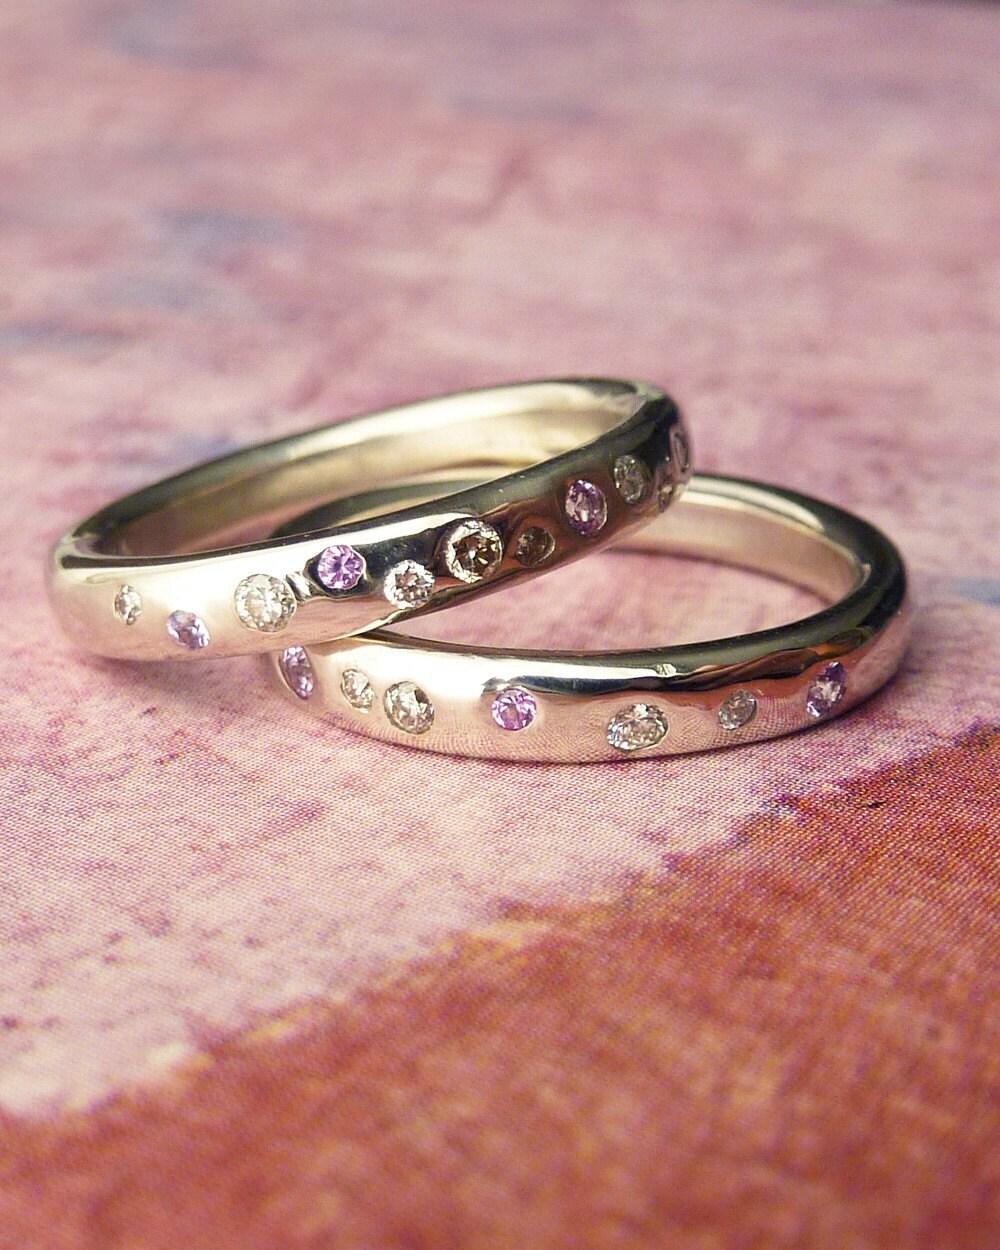 kate szabone jewellery: new jewellery this week...